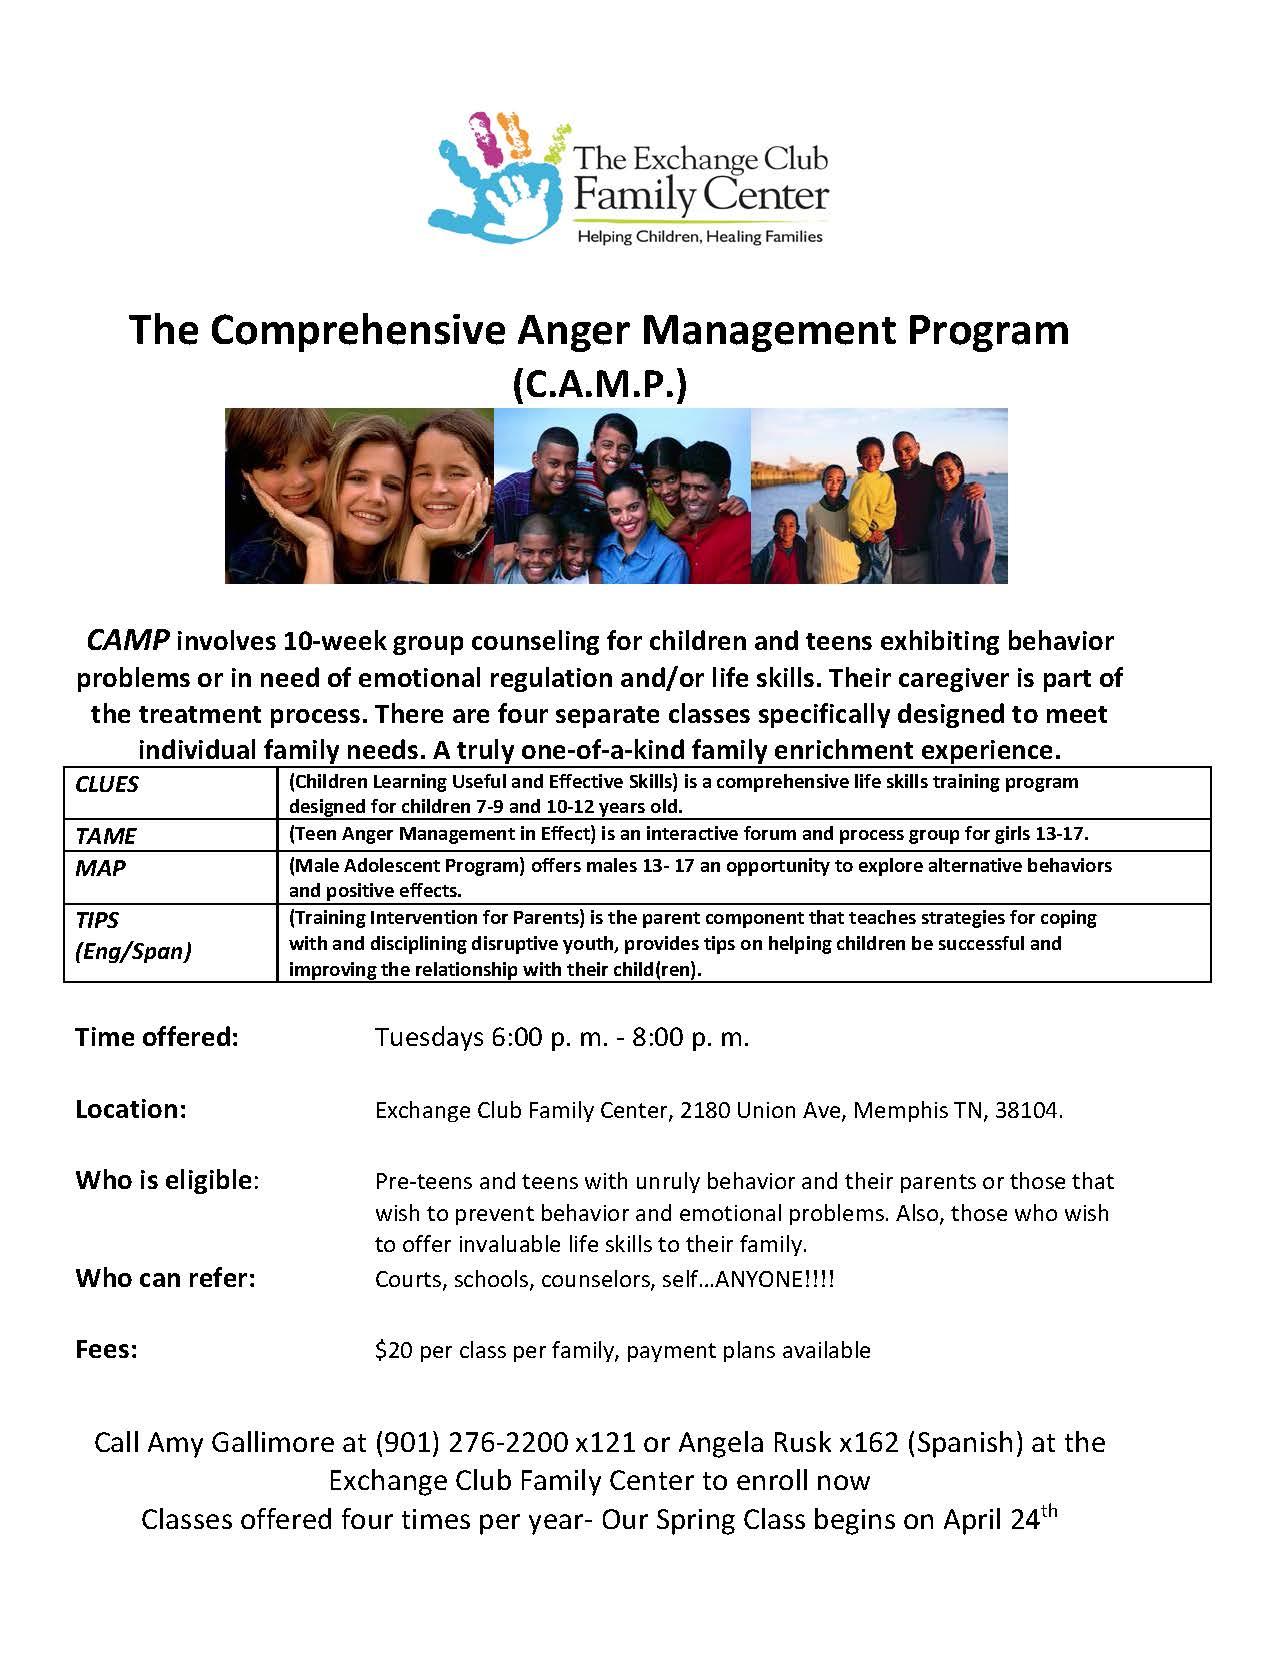 Comprehensive Anger Management (C.A.M.P.)